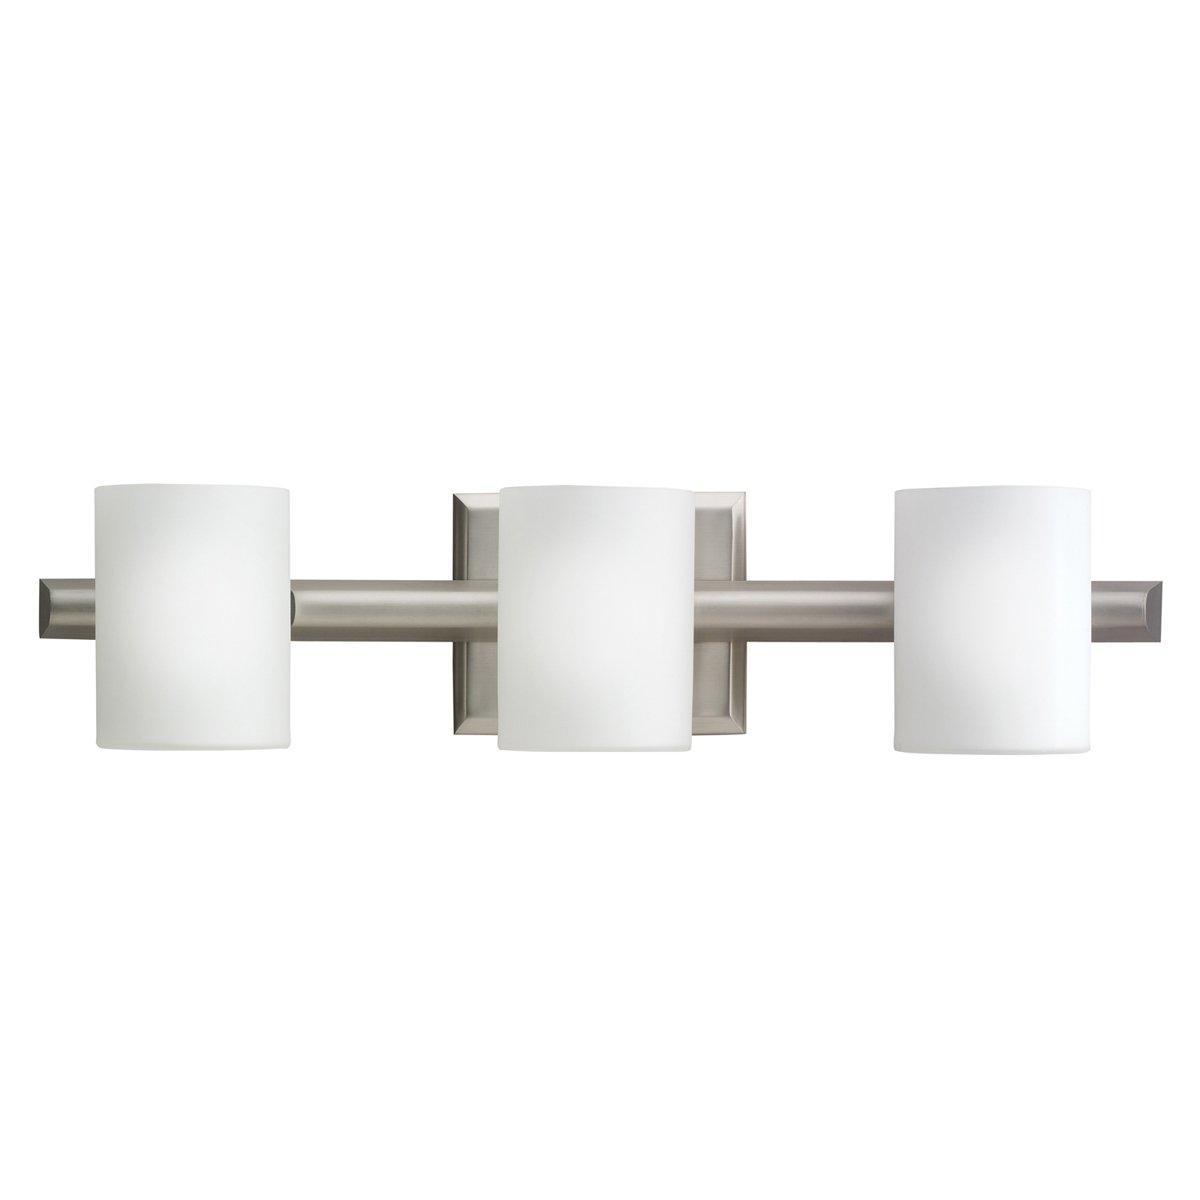 Kichler NI Four Light Bath Vanity Lighting Fixtures Amazoncom - Bathroom tube light fixtures